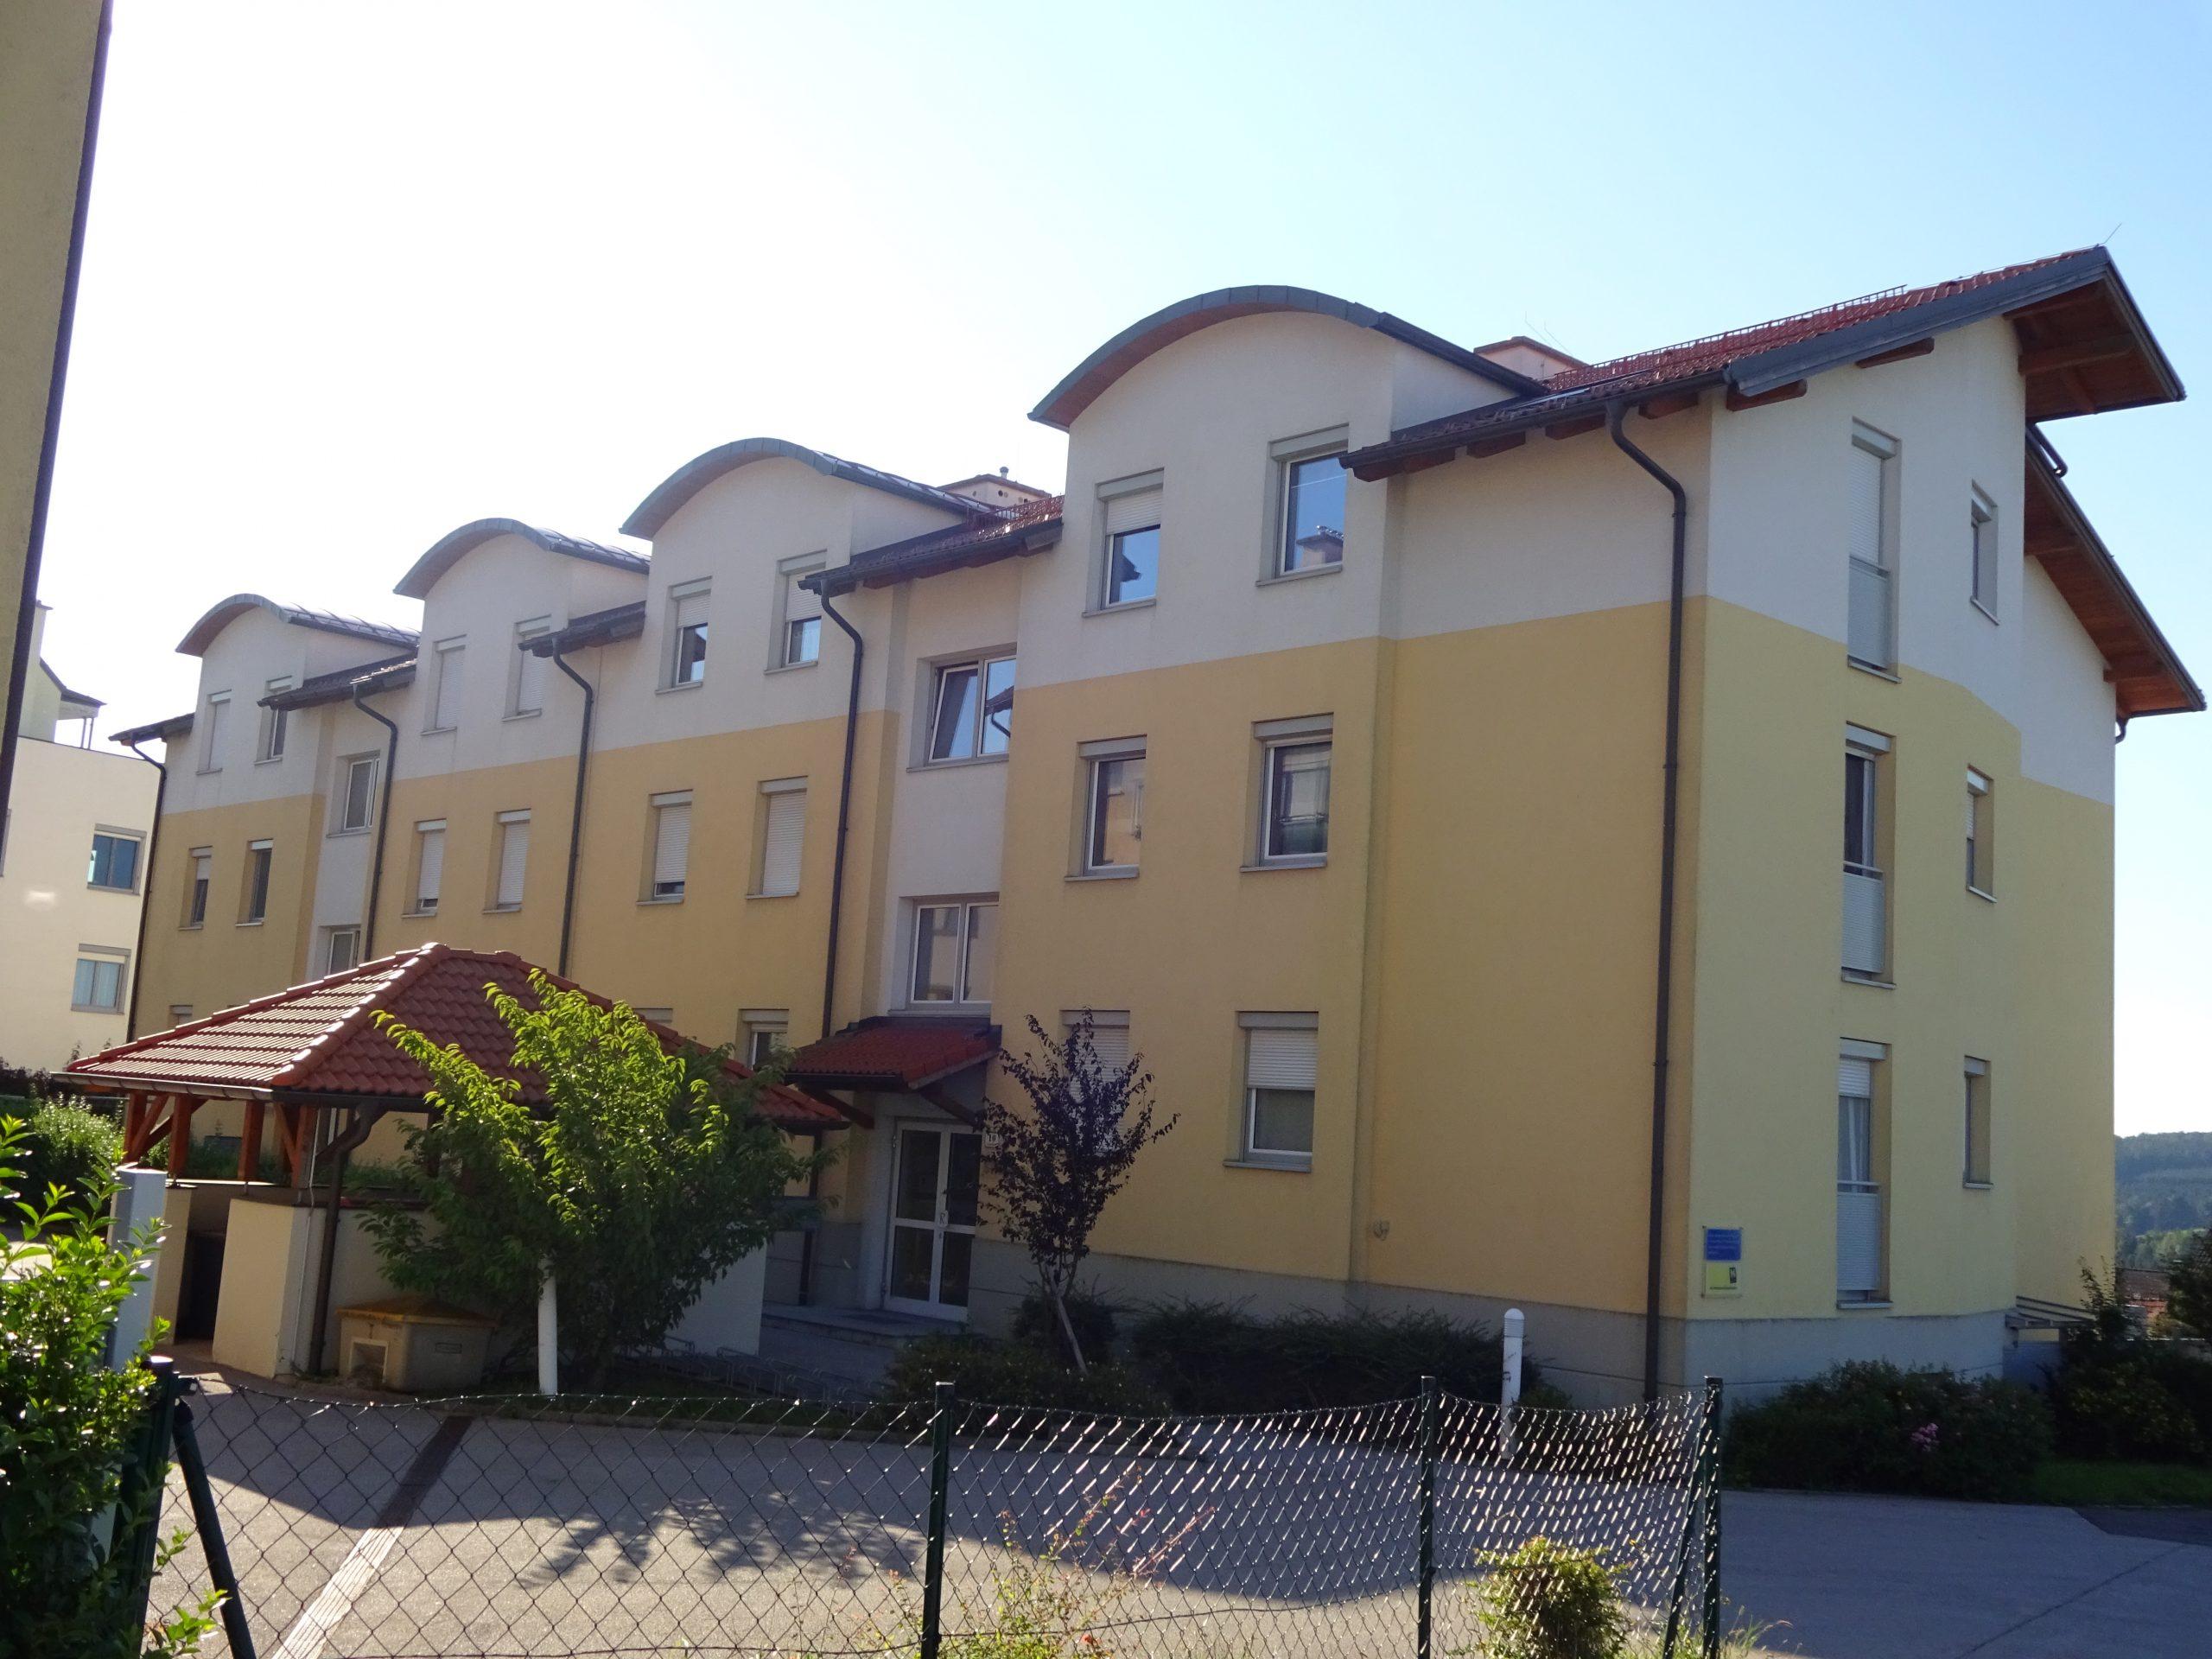 Immobilie von Kamptal in 3542 Gföhl, Krems(Land), Gföhl IV/3 - Top 704 #0